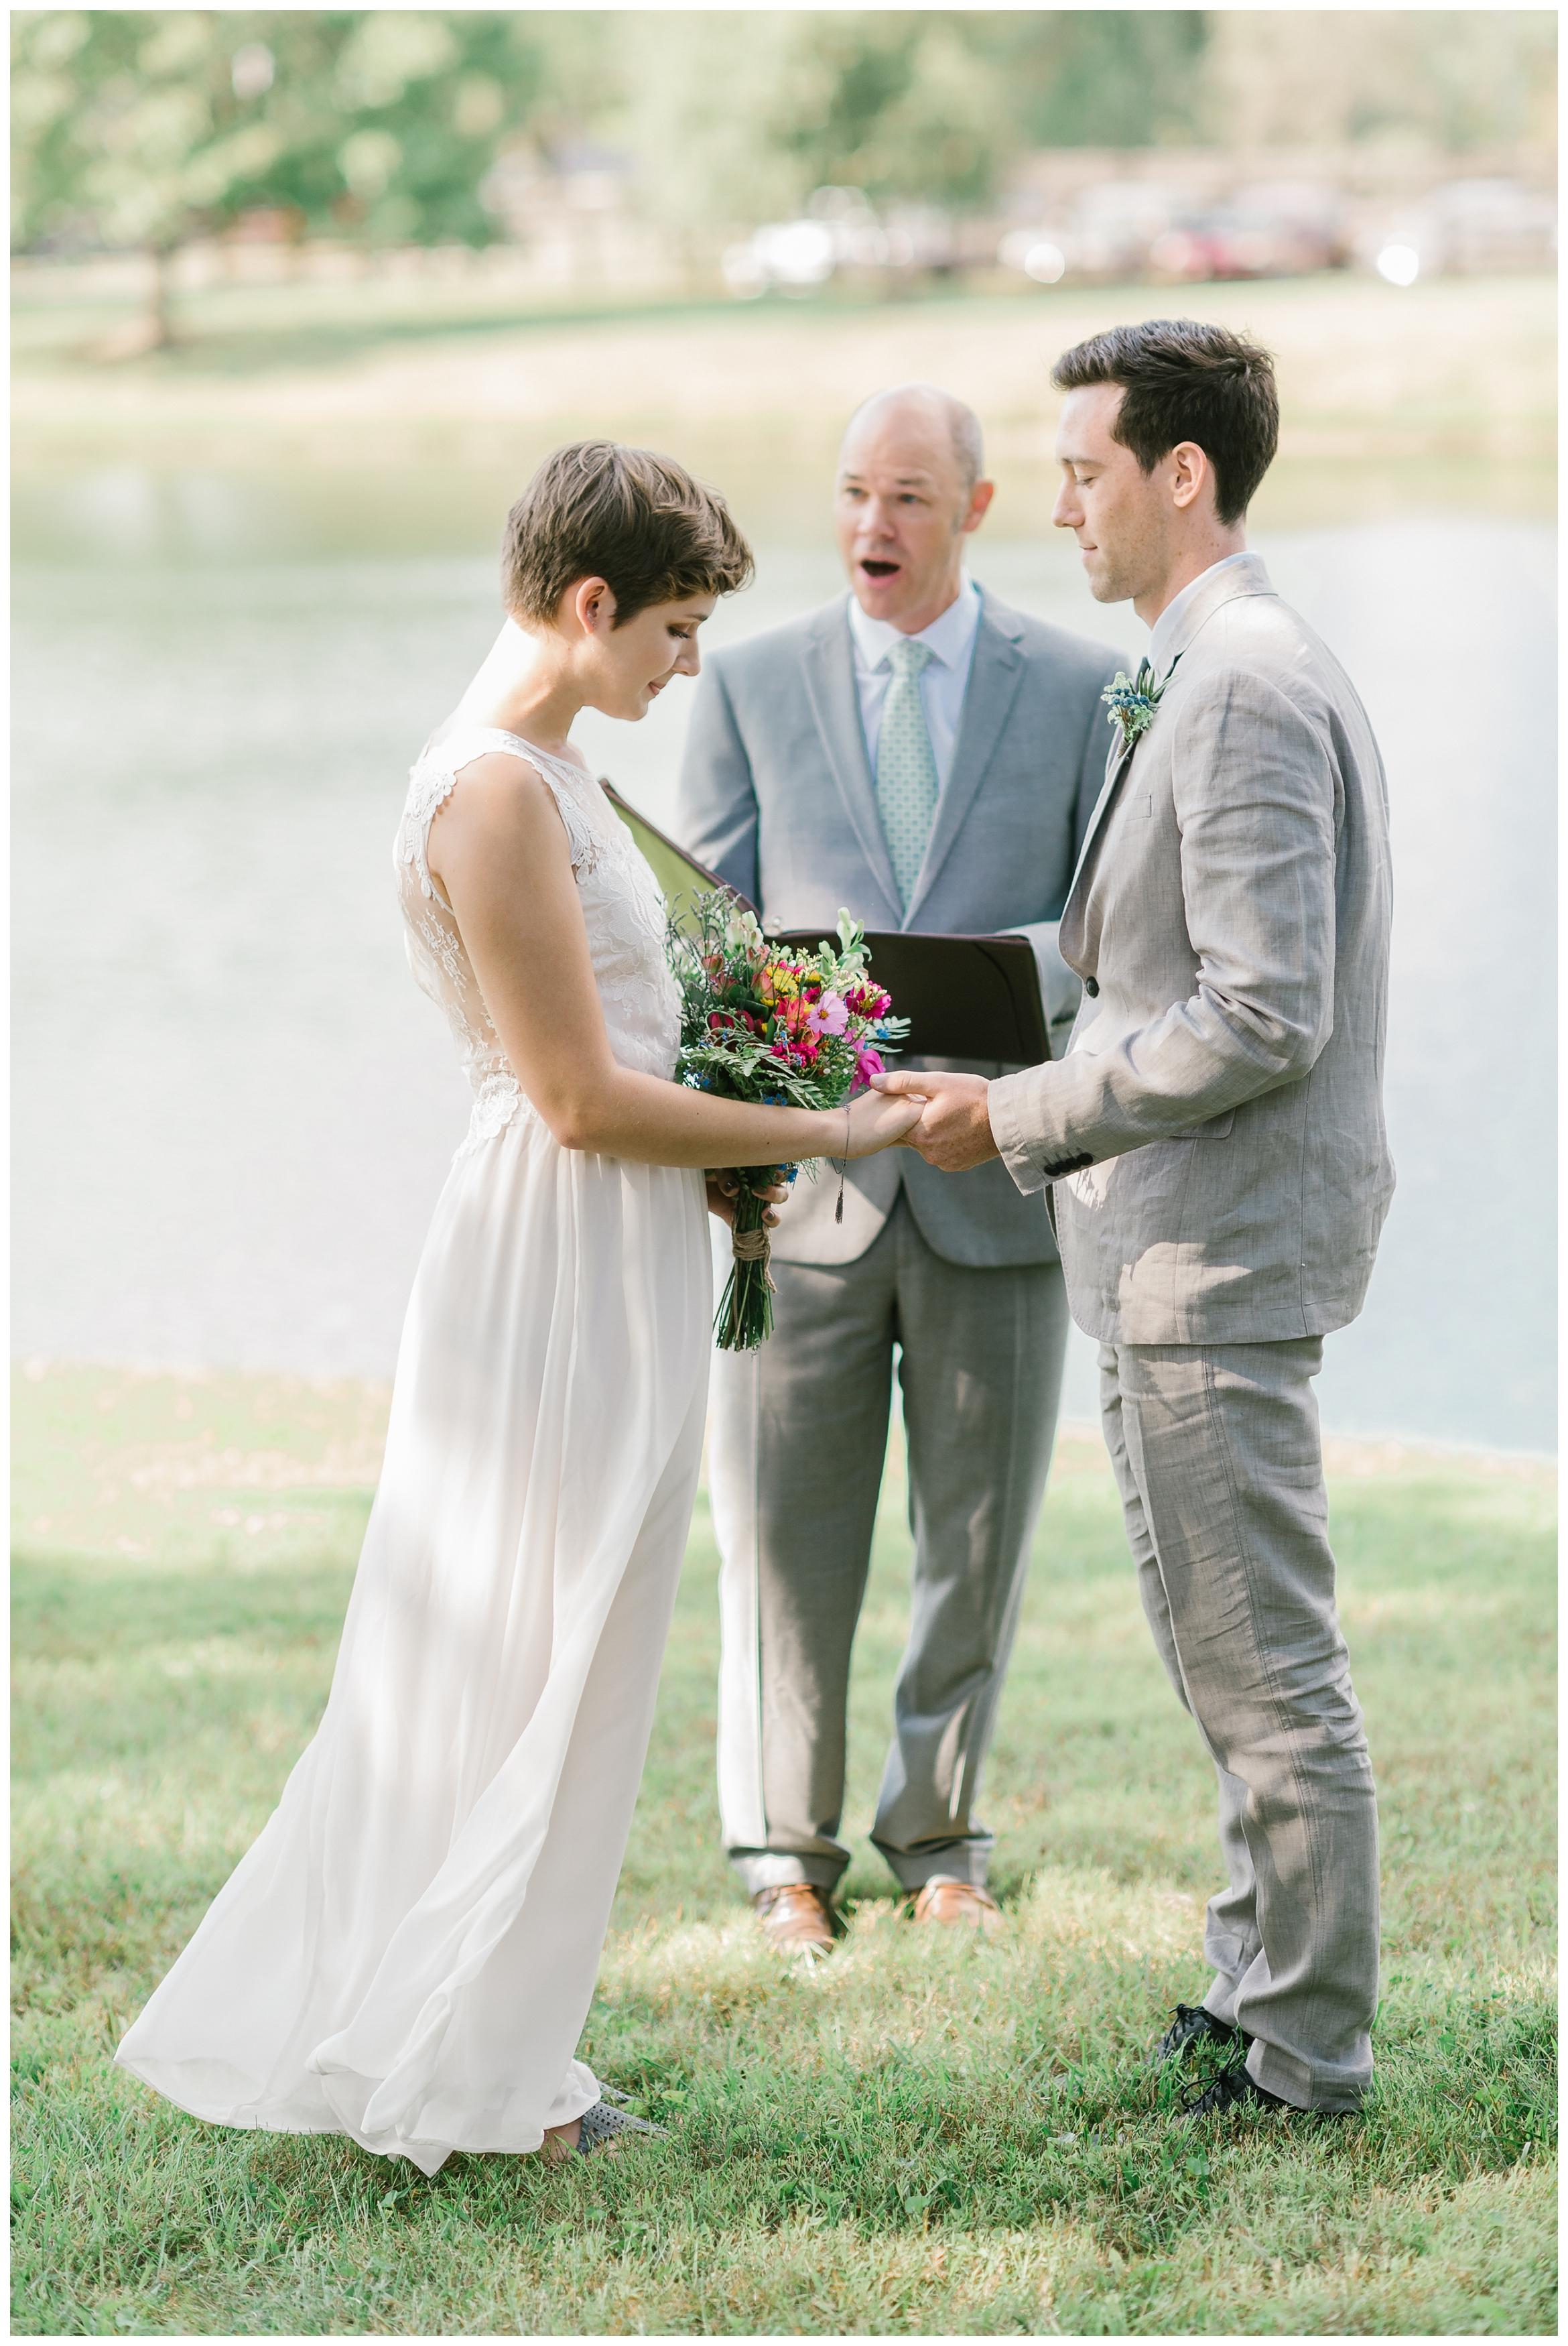 Rebecca_Shehorn_Photography_Indianapolis_Wedding_Photographer_7250.jpg